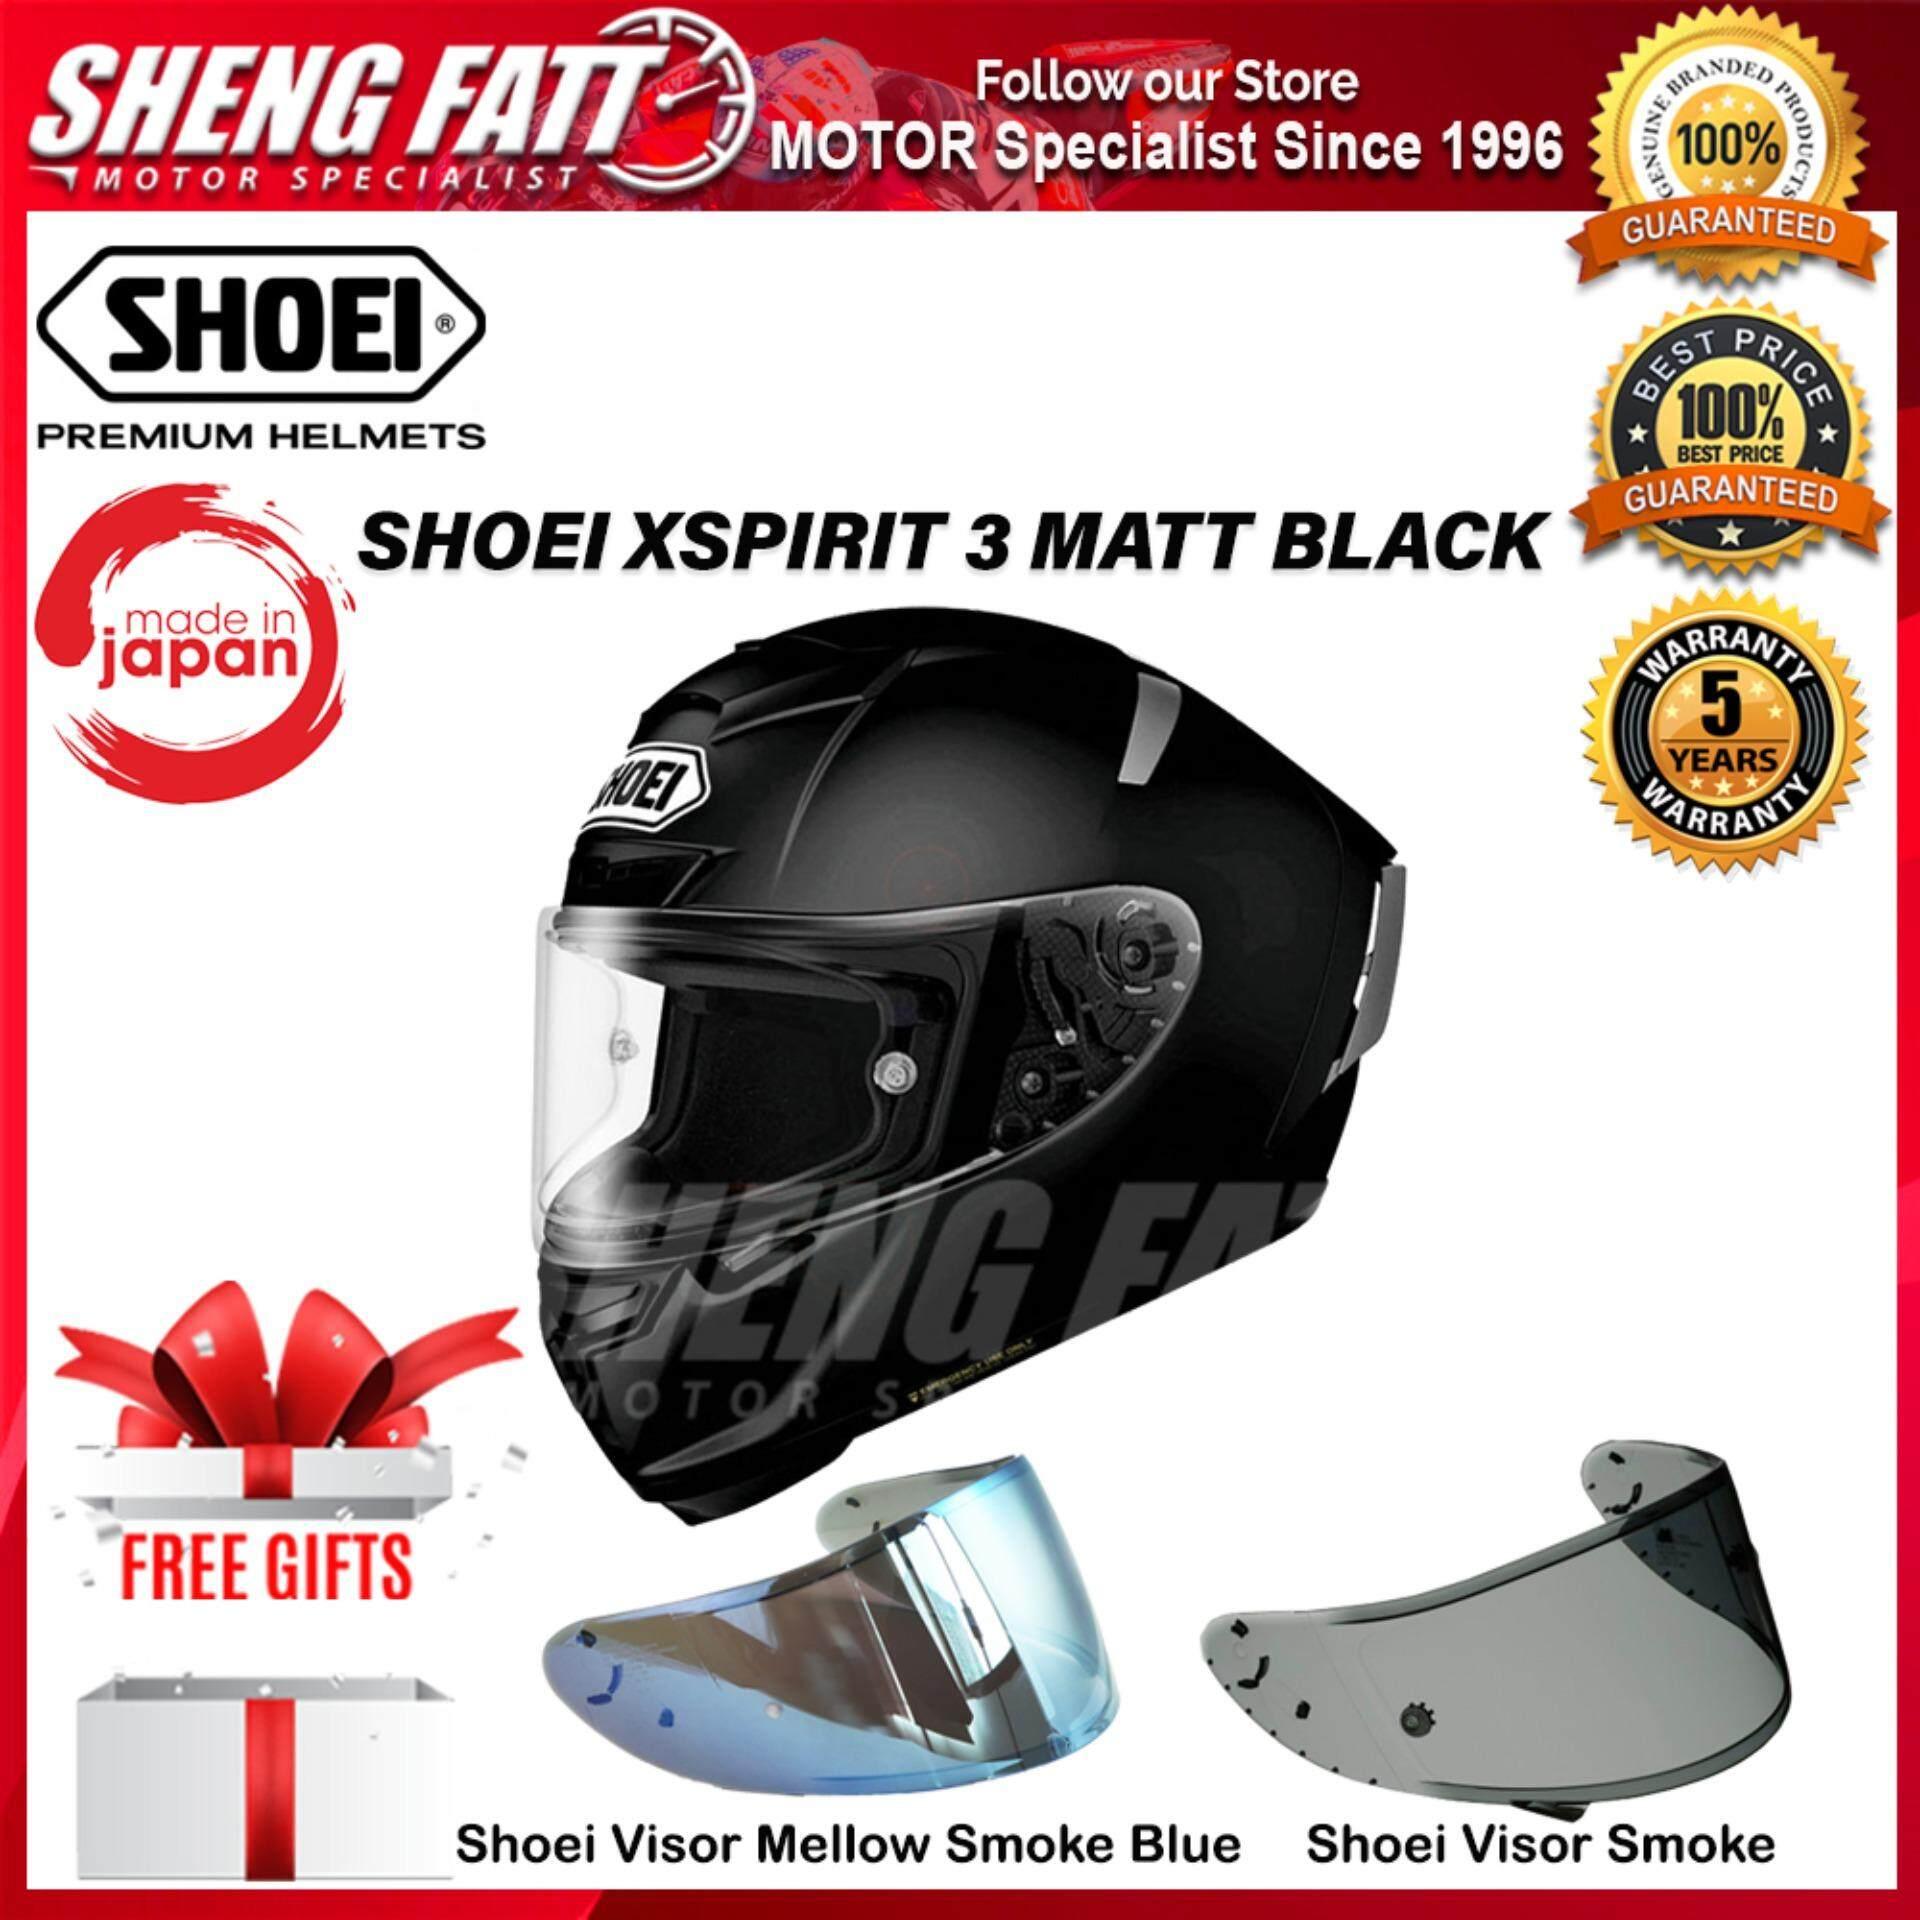 SHOEI X-SPIRIT 3 MATT BLACK - FULL FACE HELMET [ORIGINAL]